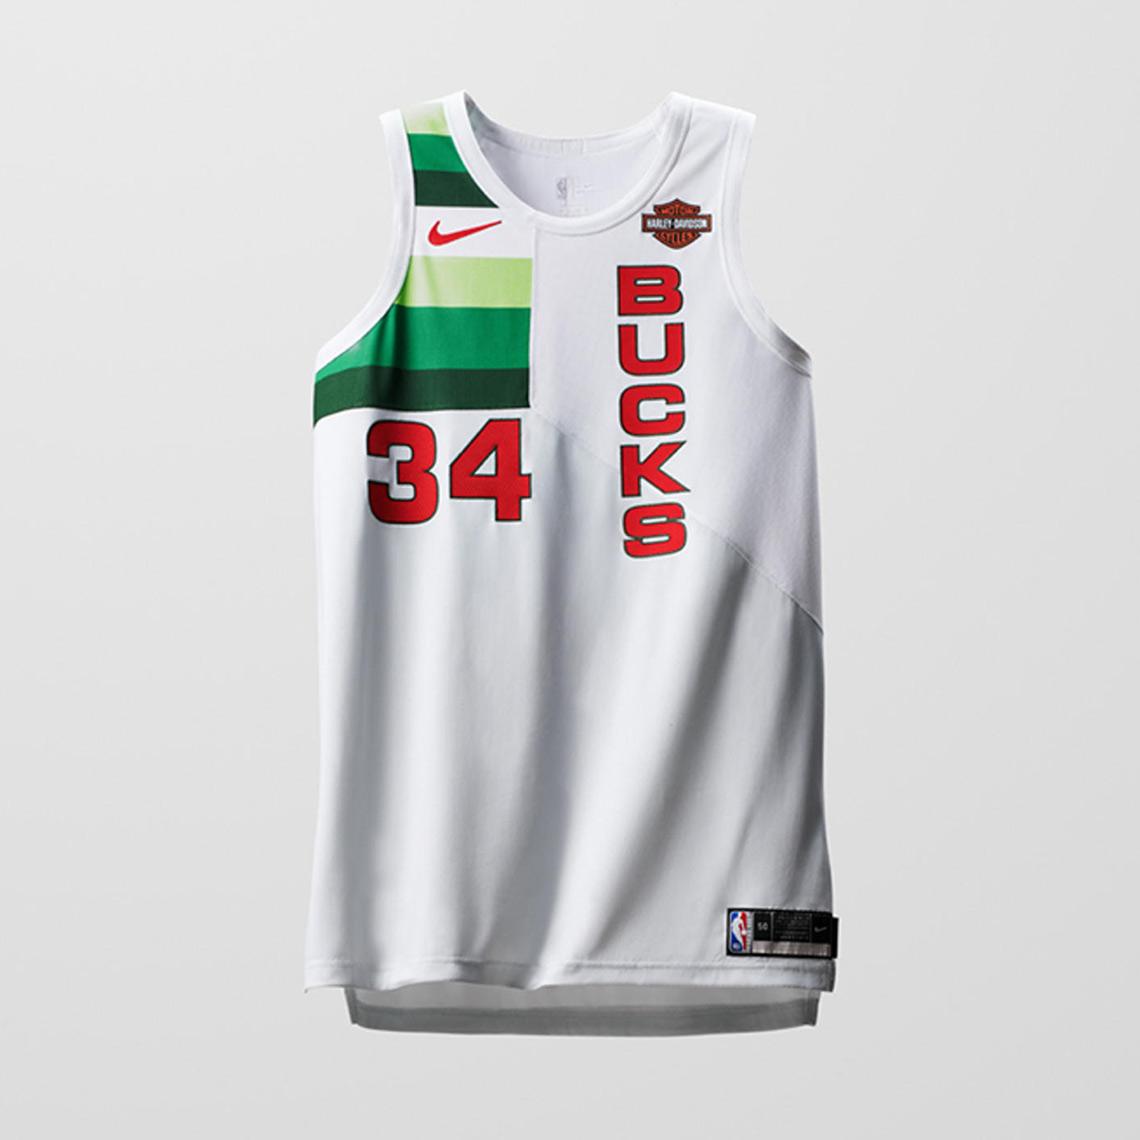 premium selection b0f2e 09e0b Nike NBA Earned Edition Jersey | SneakerNews.com